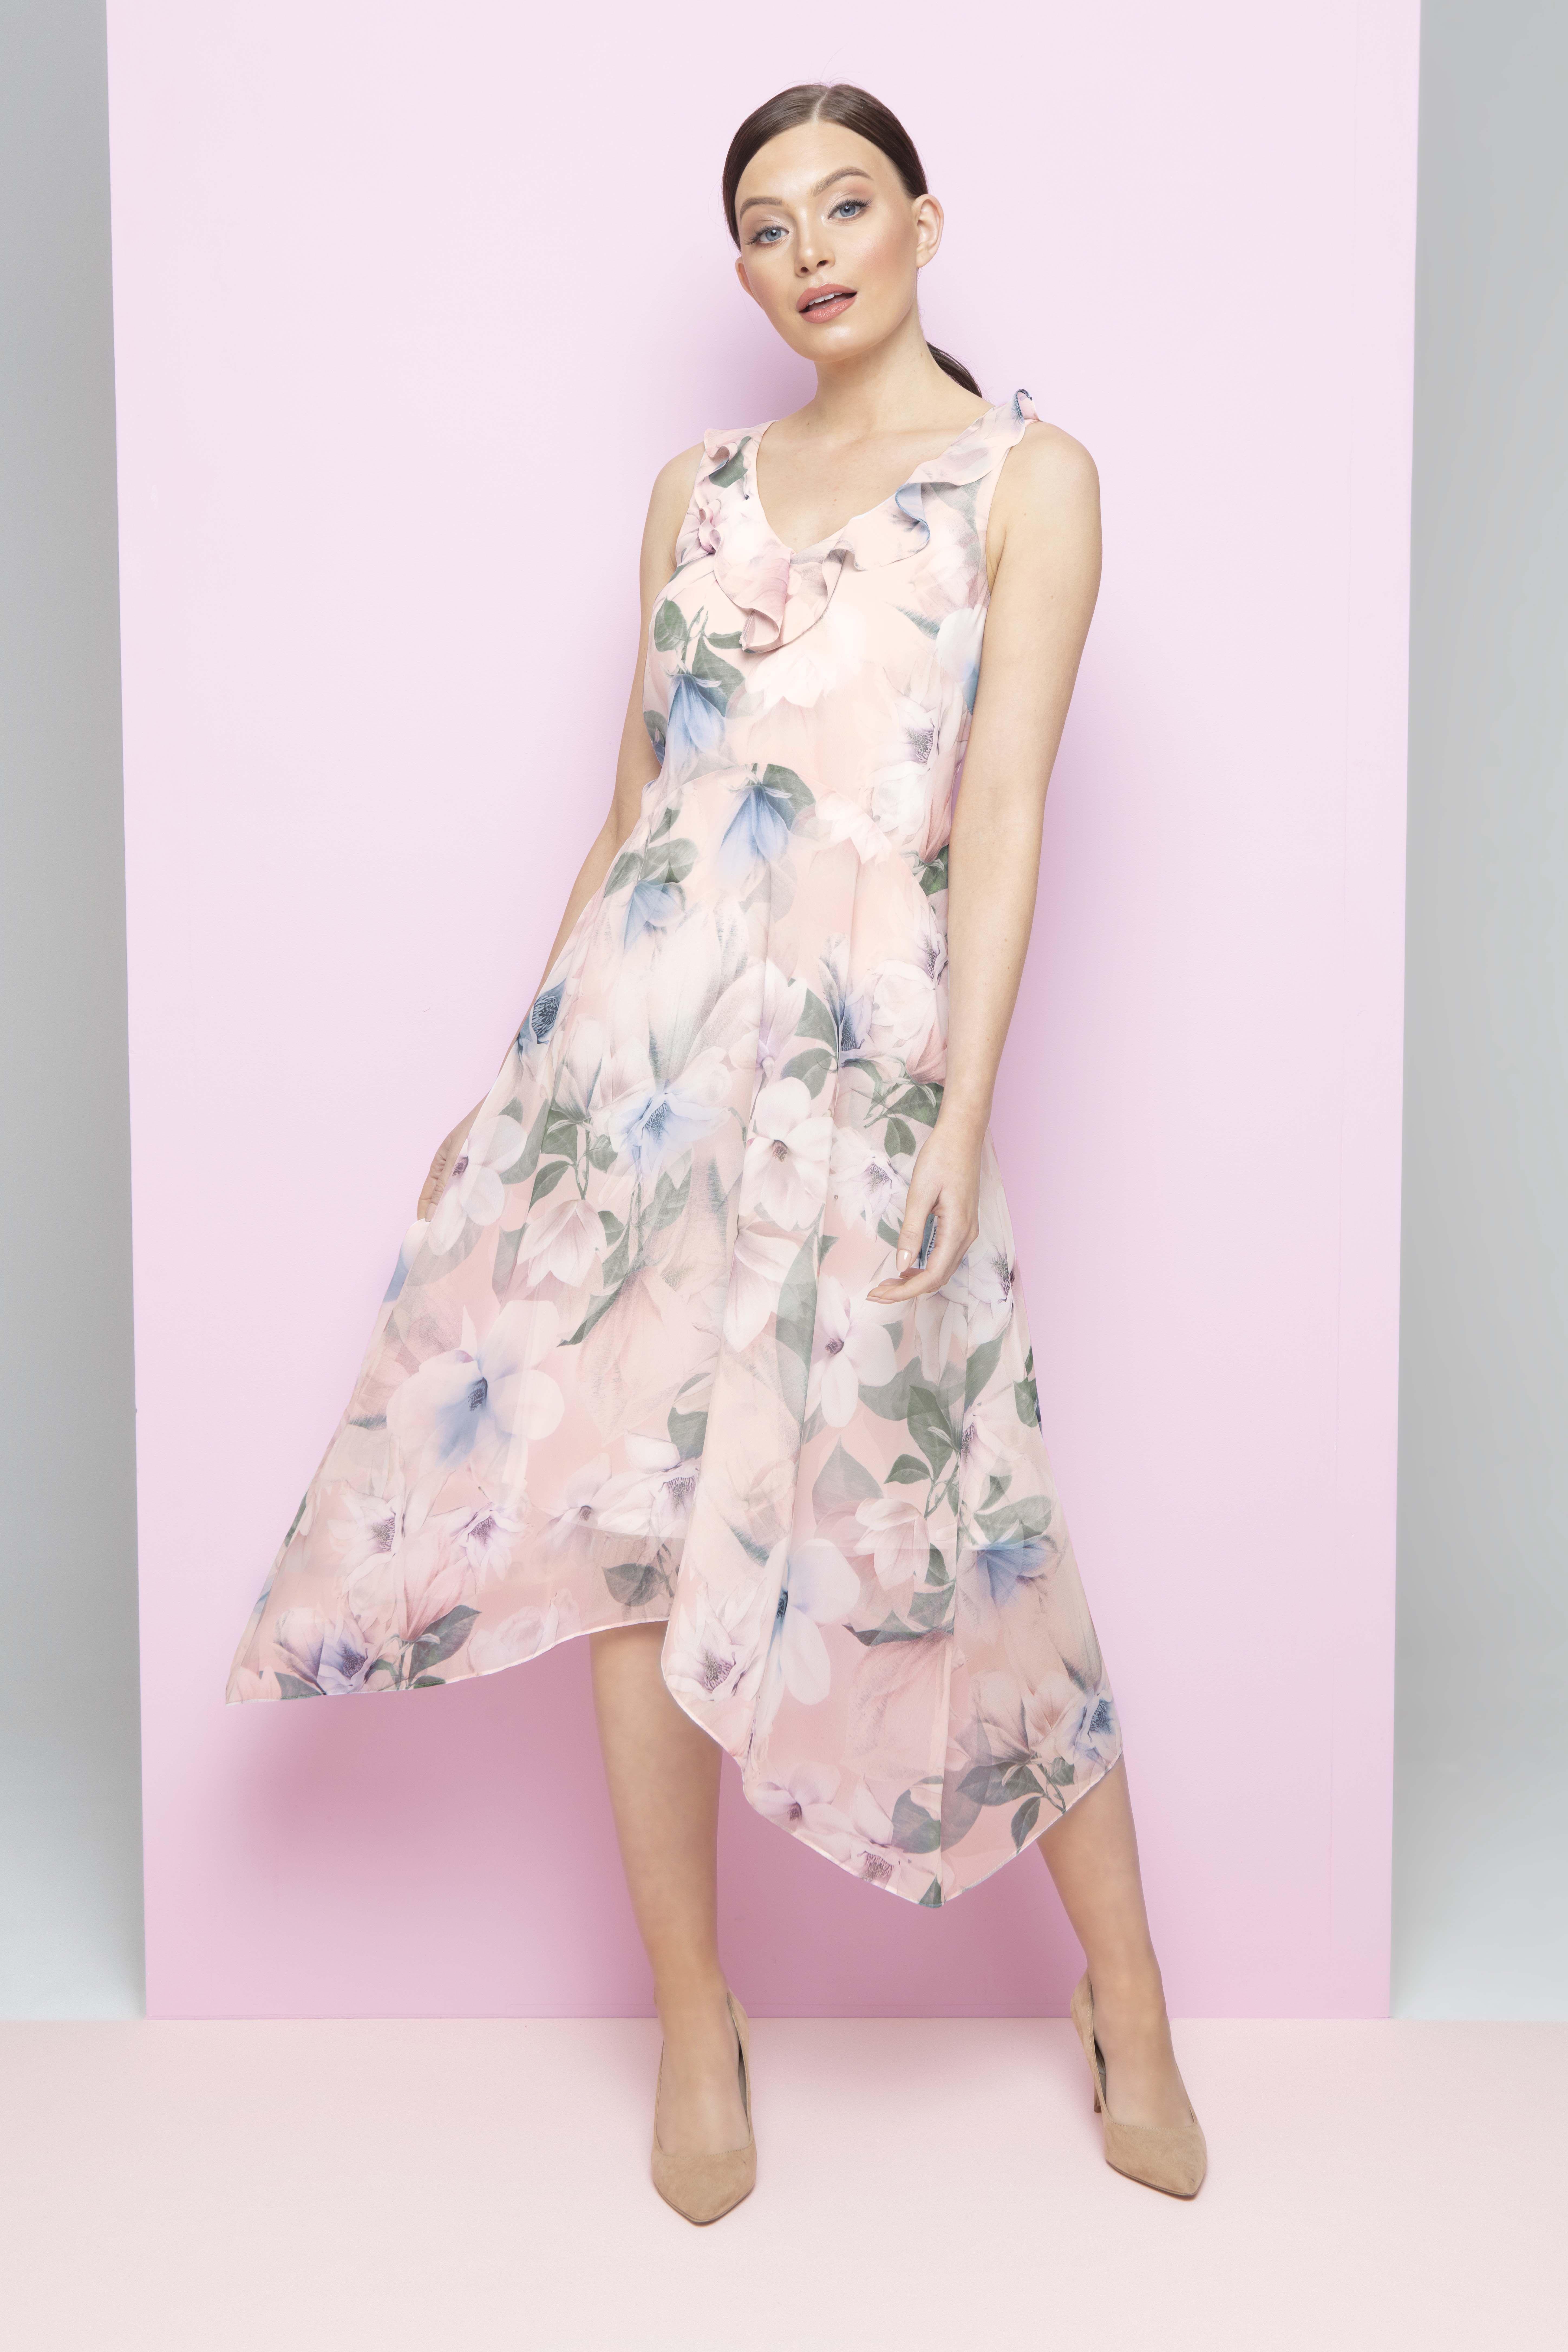 ec8a5ba50348e Floral Chiffon Frill Dress in Light Pink - Roman Originals UK | Roman SS19  | Floral chiffon, Frill dress, Floral